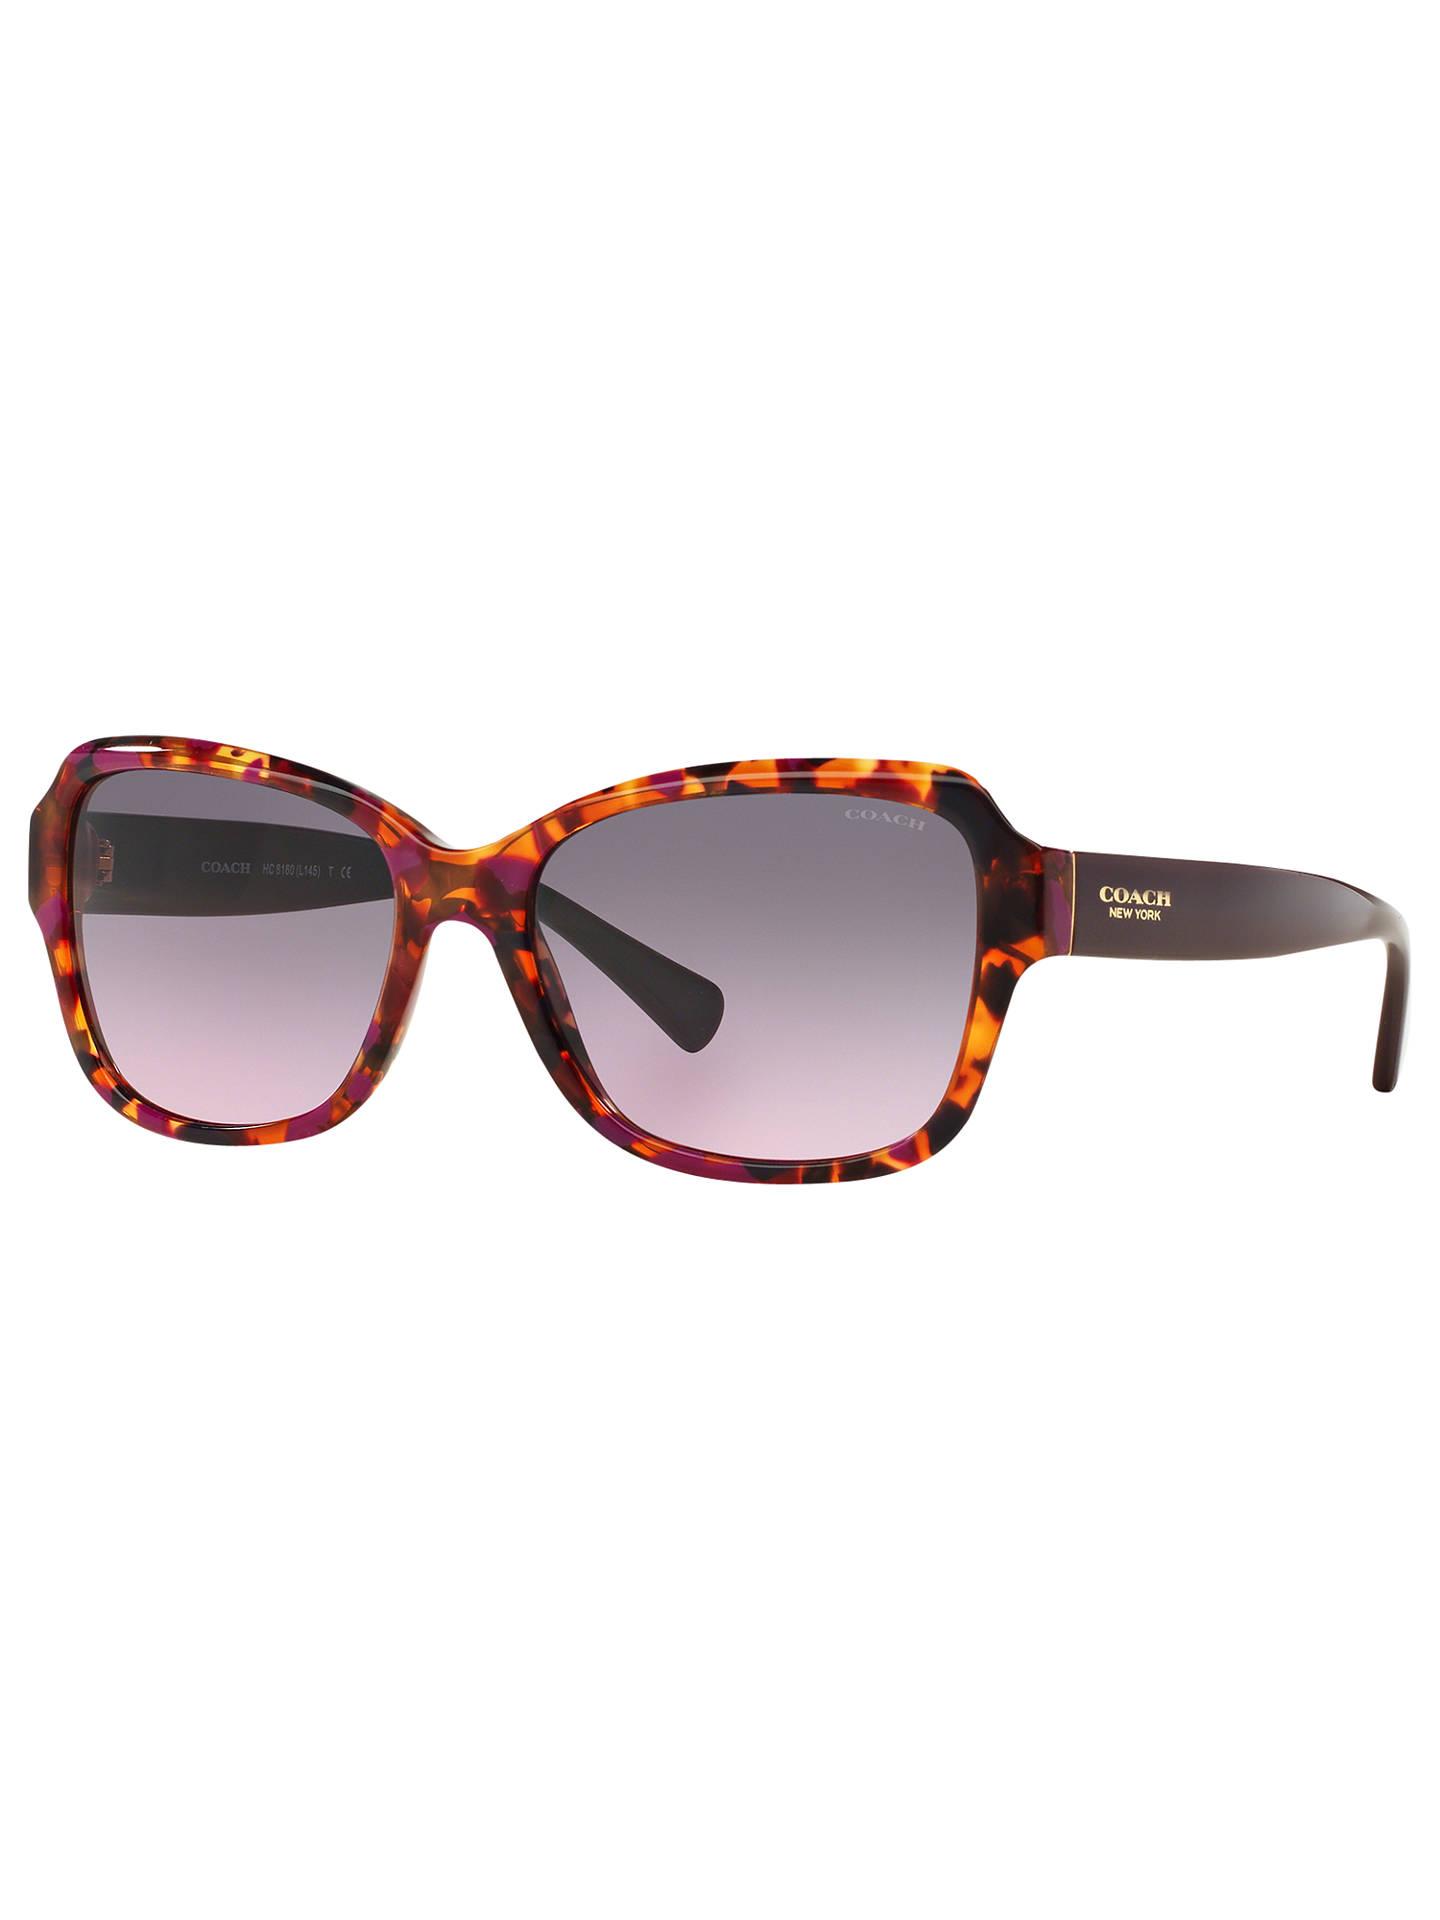 f0b1b41d61 greece buycoach hc8160 square sunglasses purple confetti online at  johnlewis e52df 89138